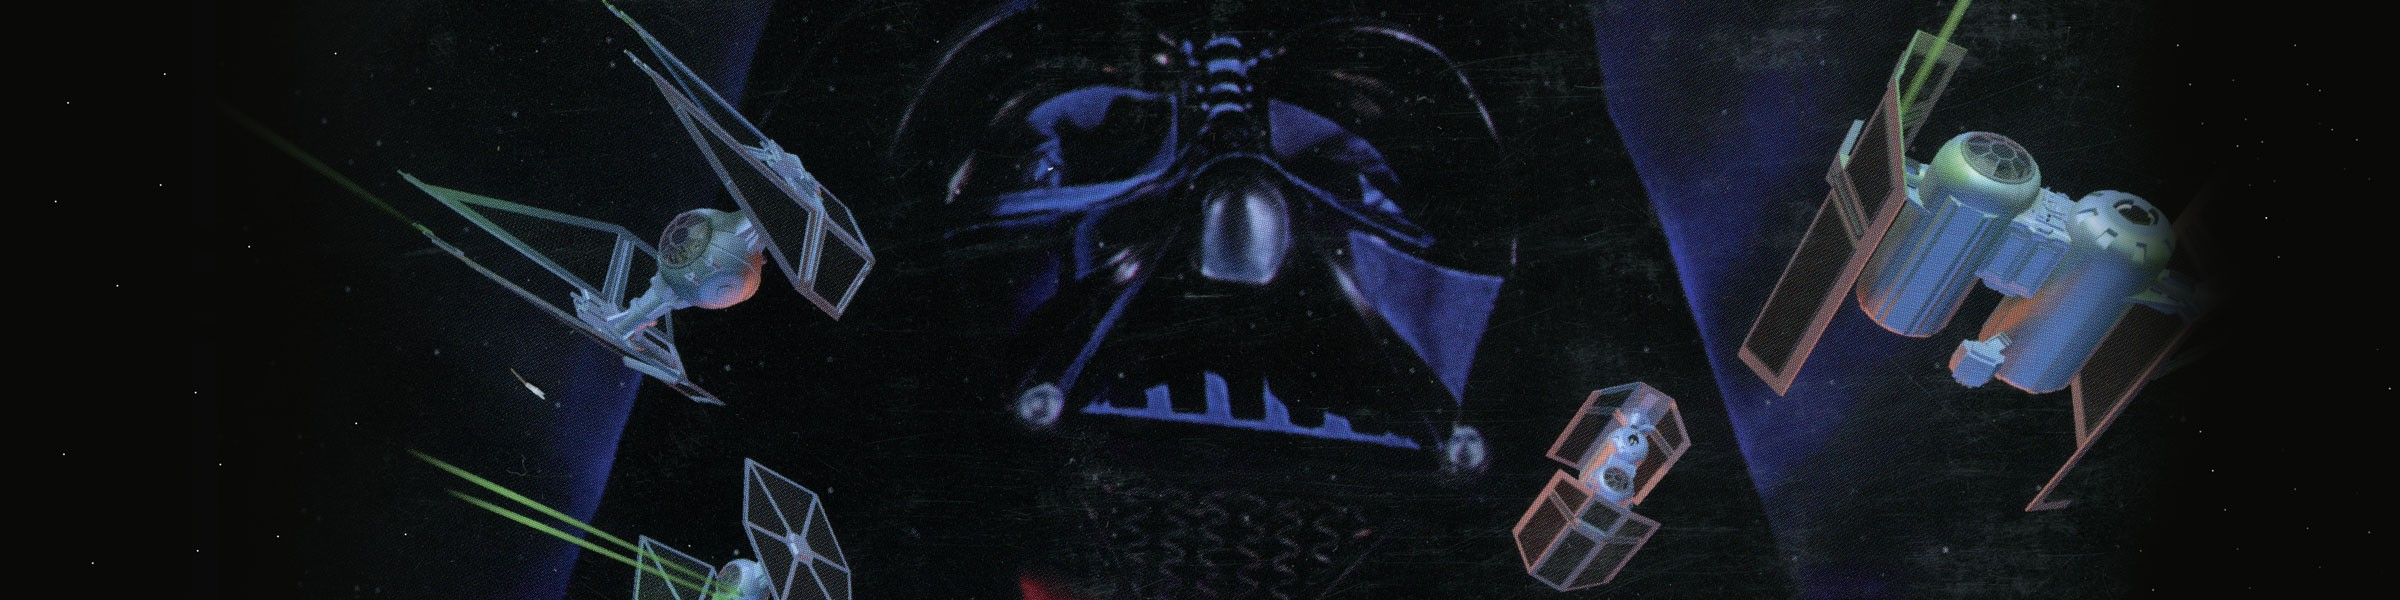 Star Wars Tie Fighter Special Edition Pour Pc Origin